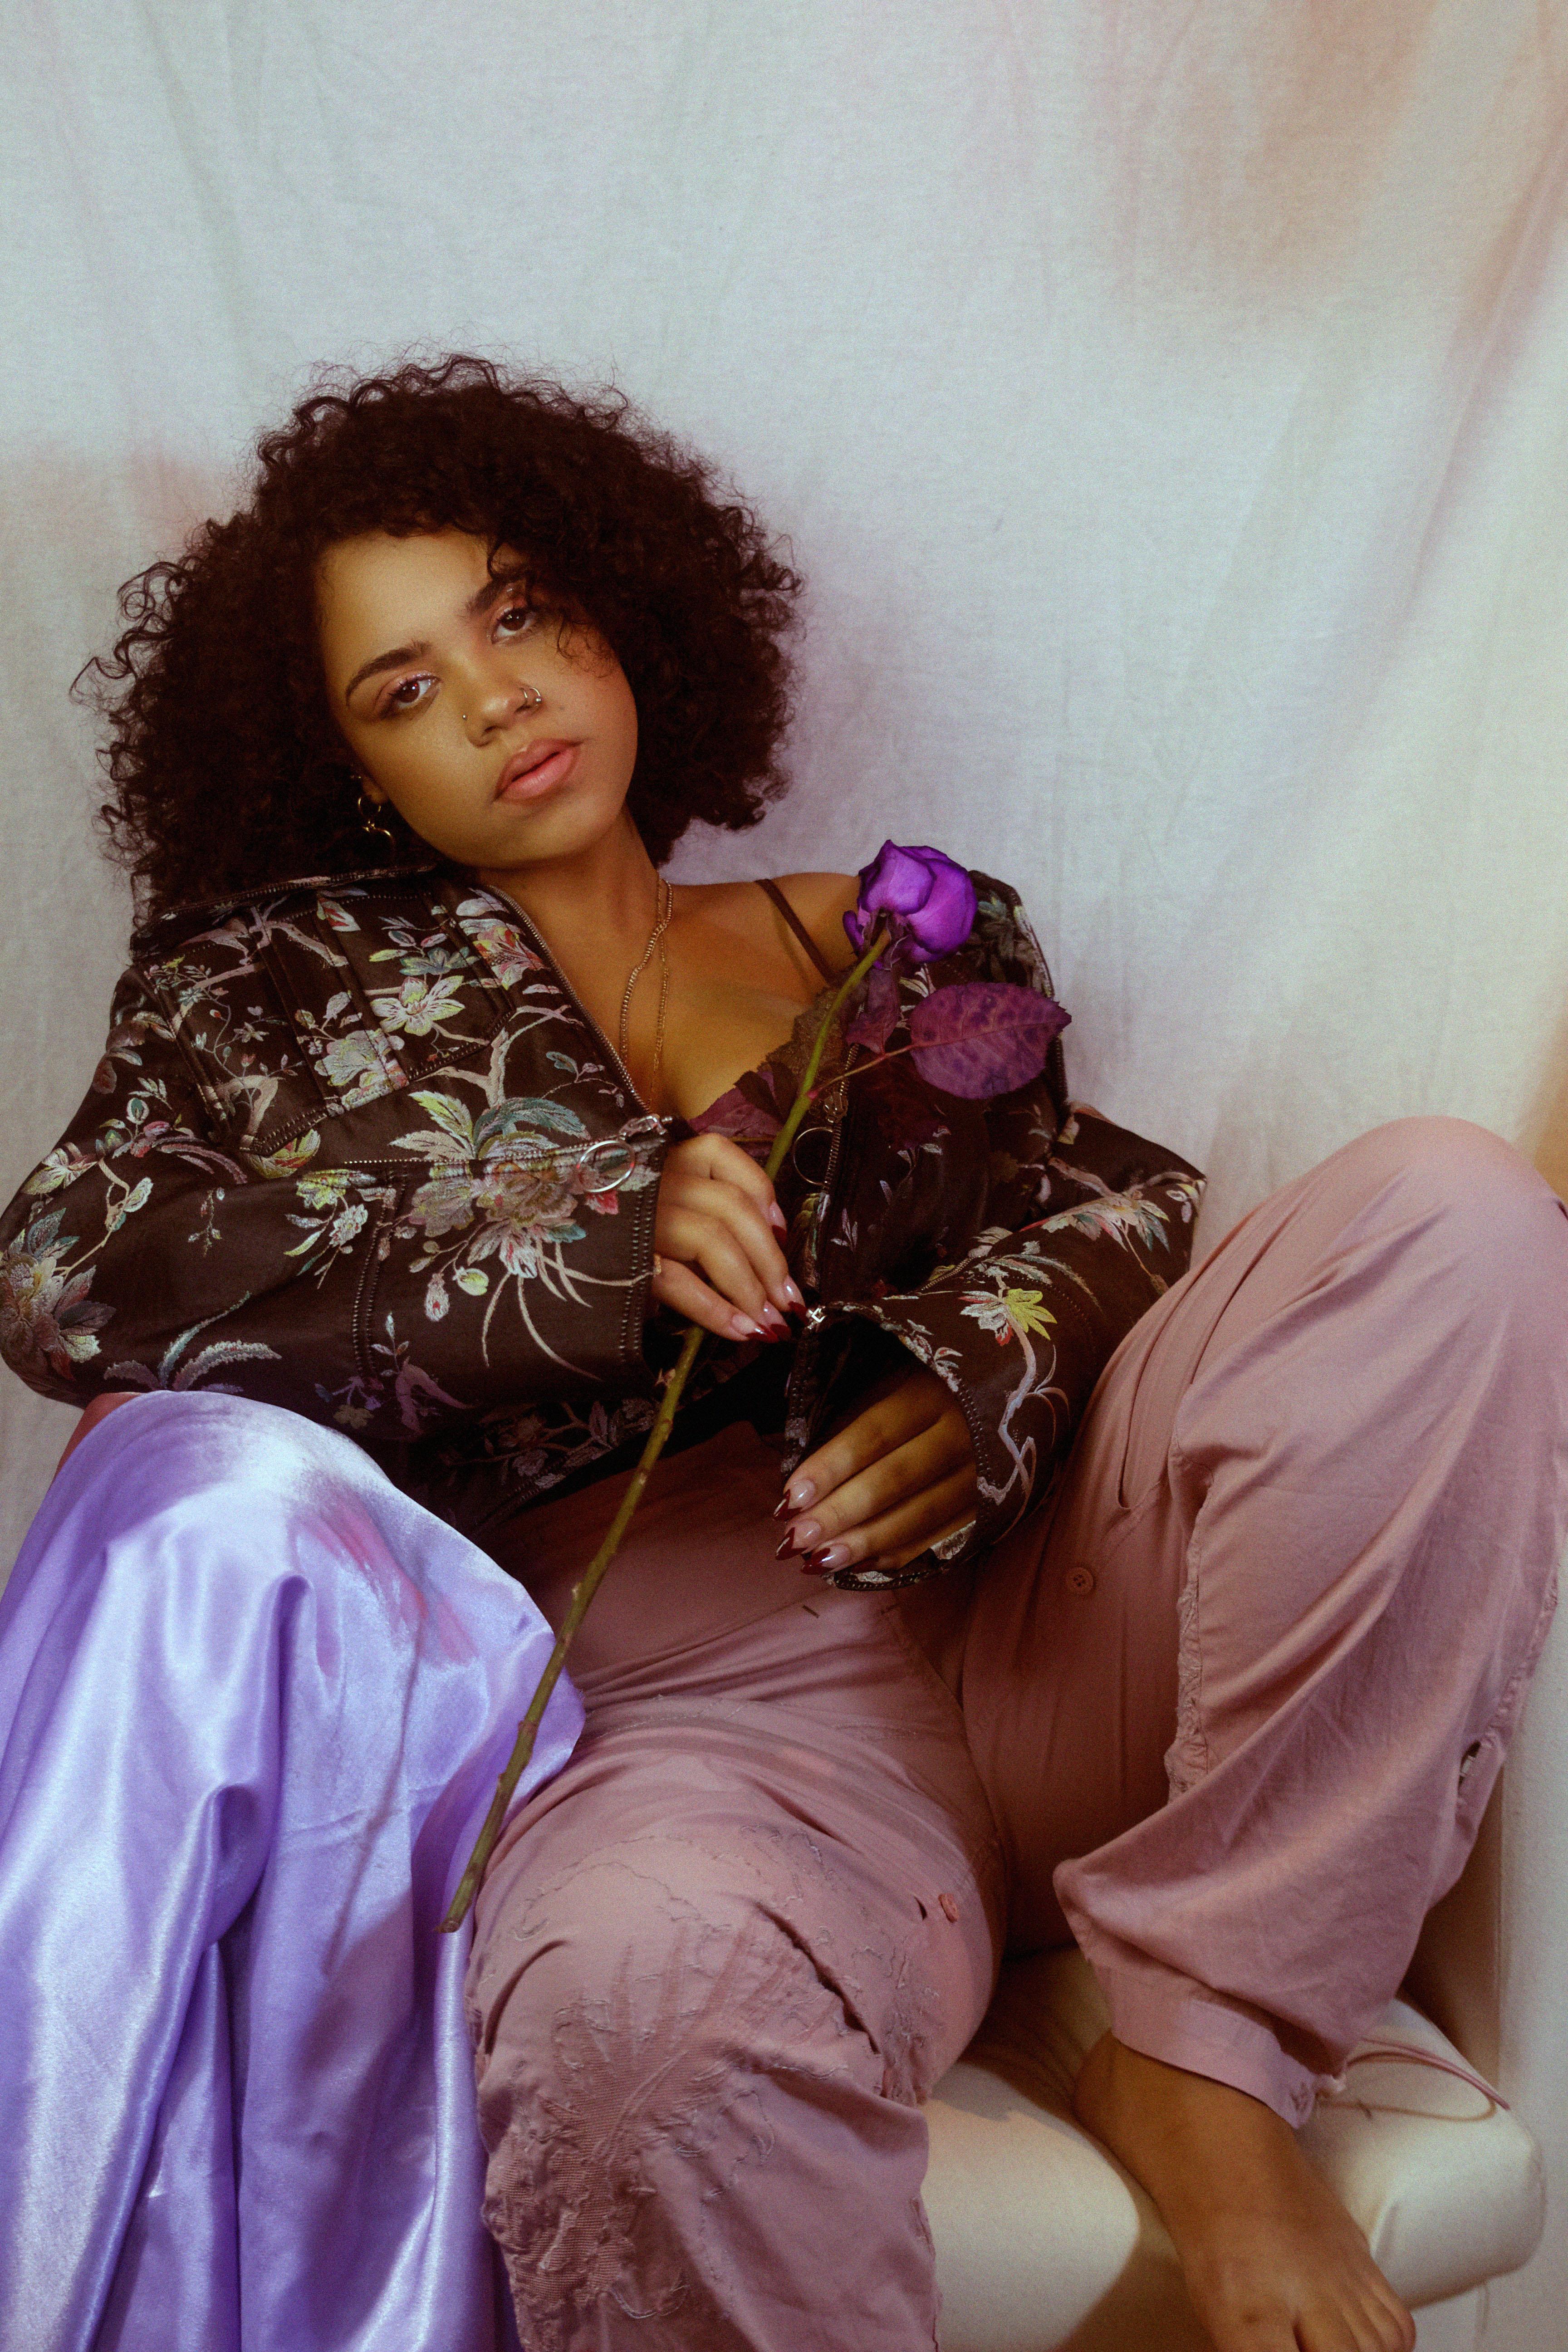 British Newcomer Ebony Frainteso INDIE Magazine